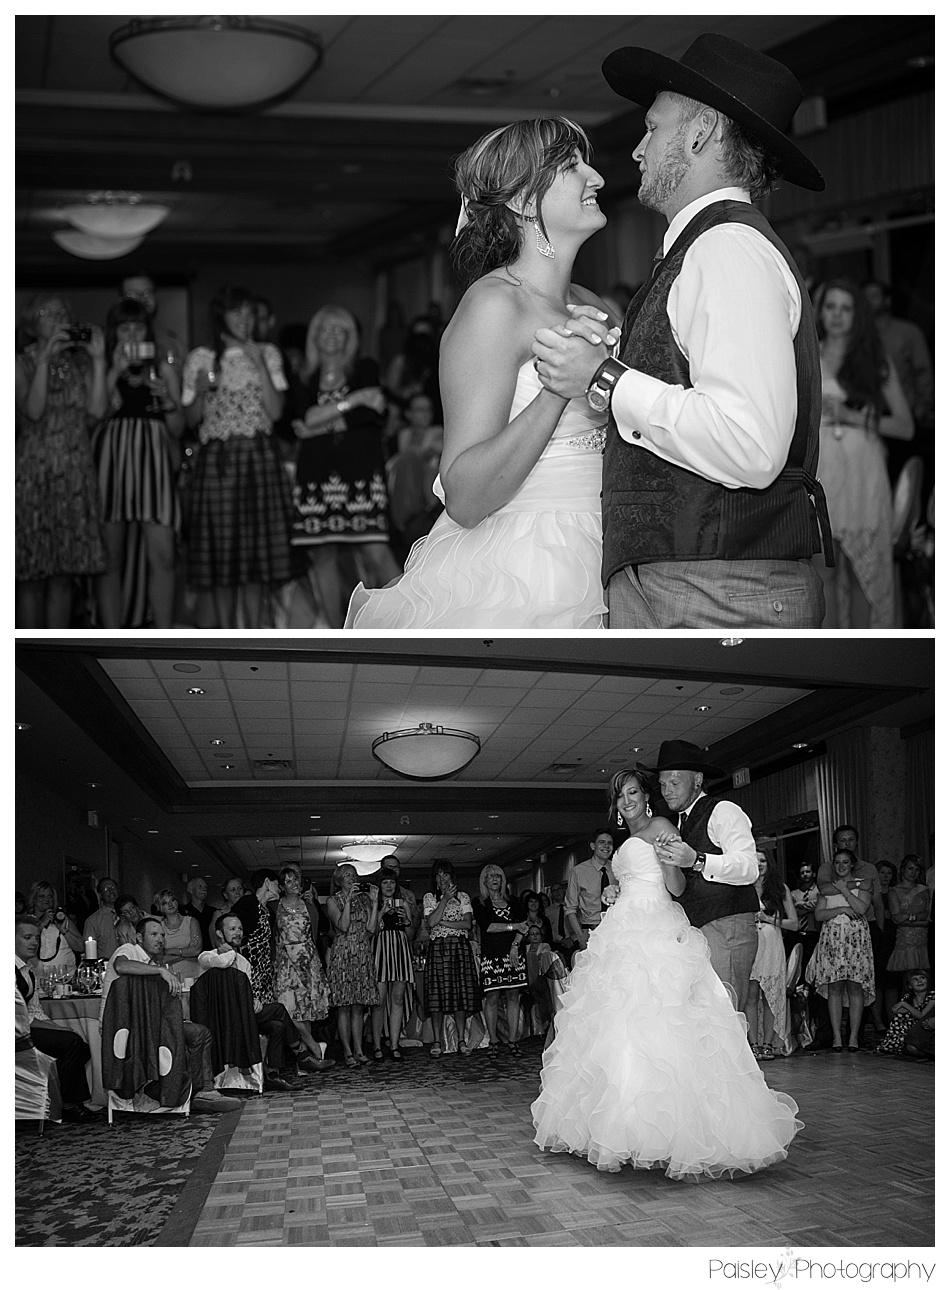 Manteo Wedding Reception, Manteo Kelowna Wedding, Kelowna Lake Front Wedding Reception, Kelowna Wedding, Kelowna Wedding Photographer, Okanagan Lake Wedding, Okanagan Wedding Reception, Vernon Wedding, Calgary Wedding Photographer, Cochrane Wedding Photographer